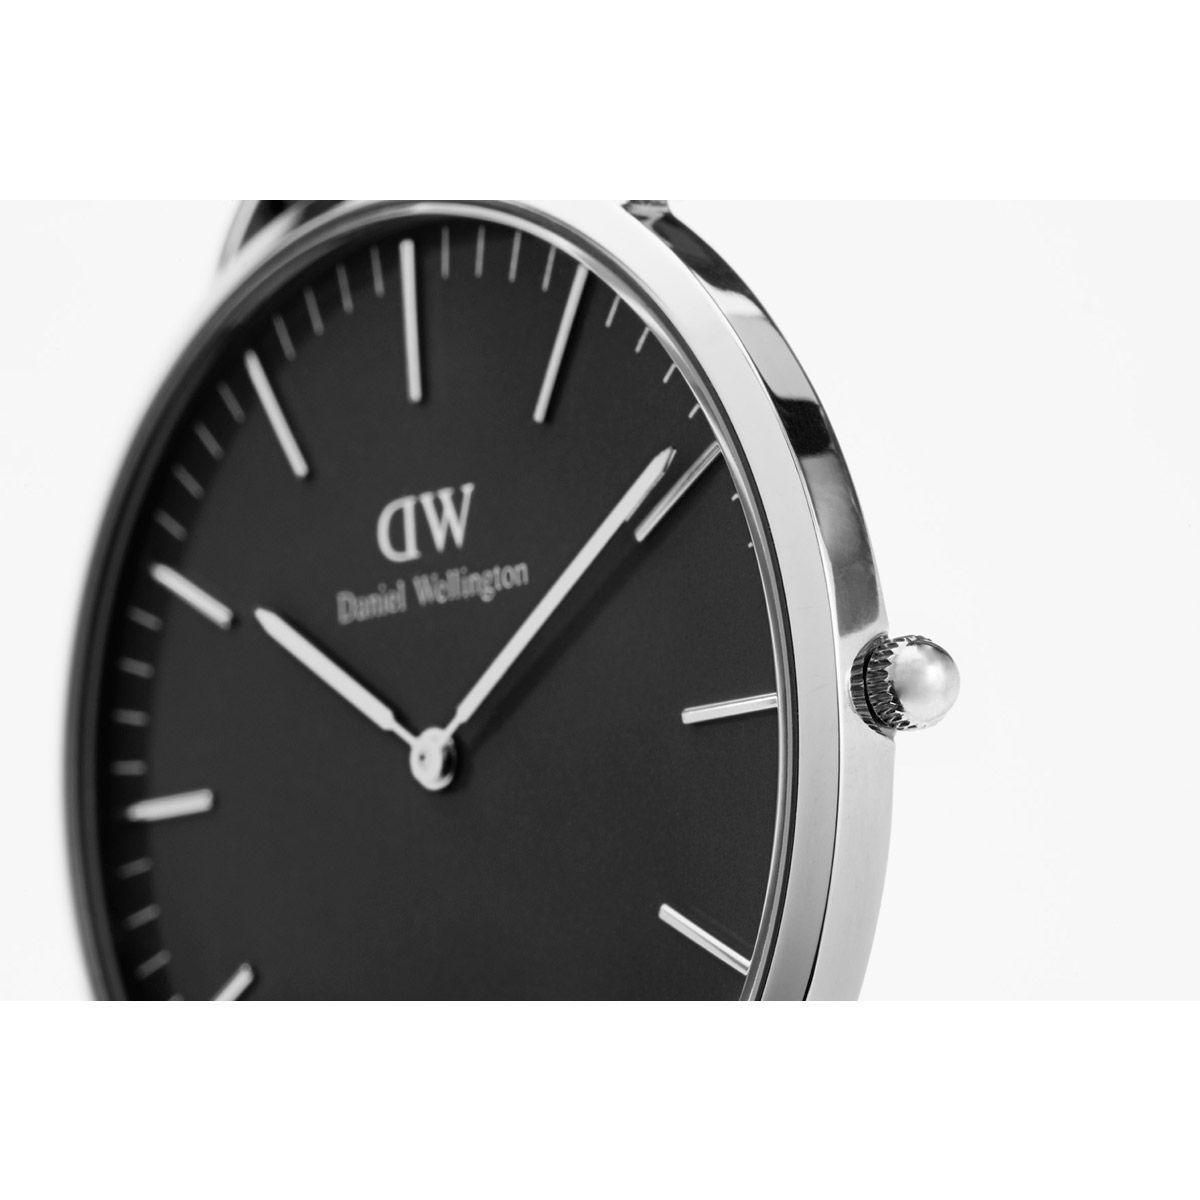 dw官网 dw手表官网 dw中国官网 dw官方旗舰店 DW DW官网  W Classic Black Sheffield Silver 40mm